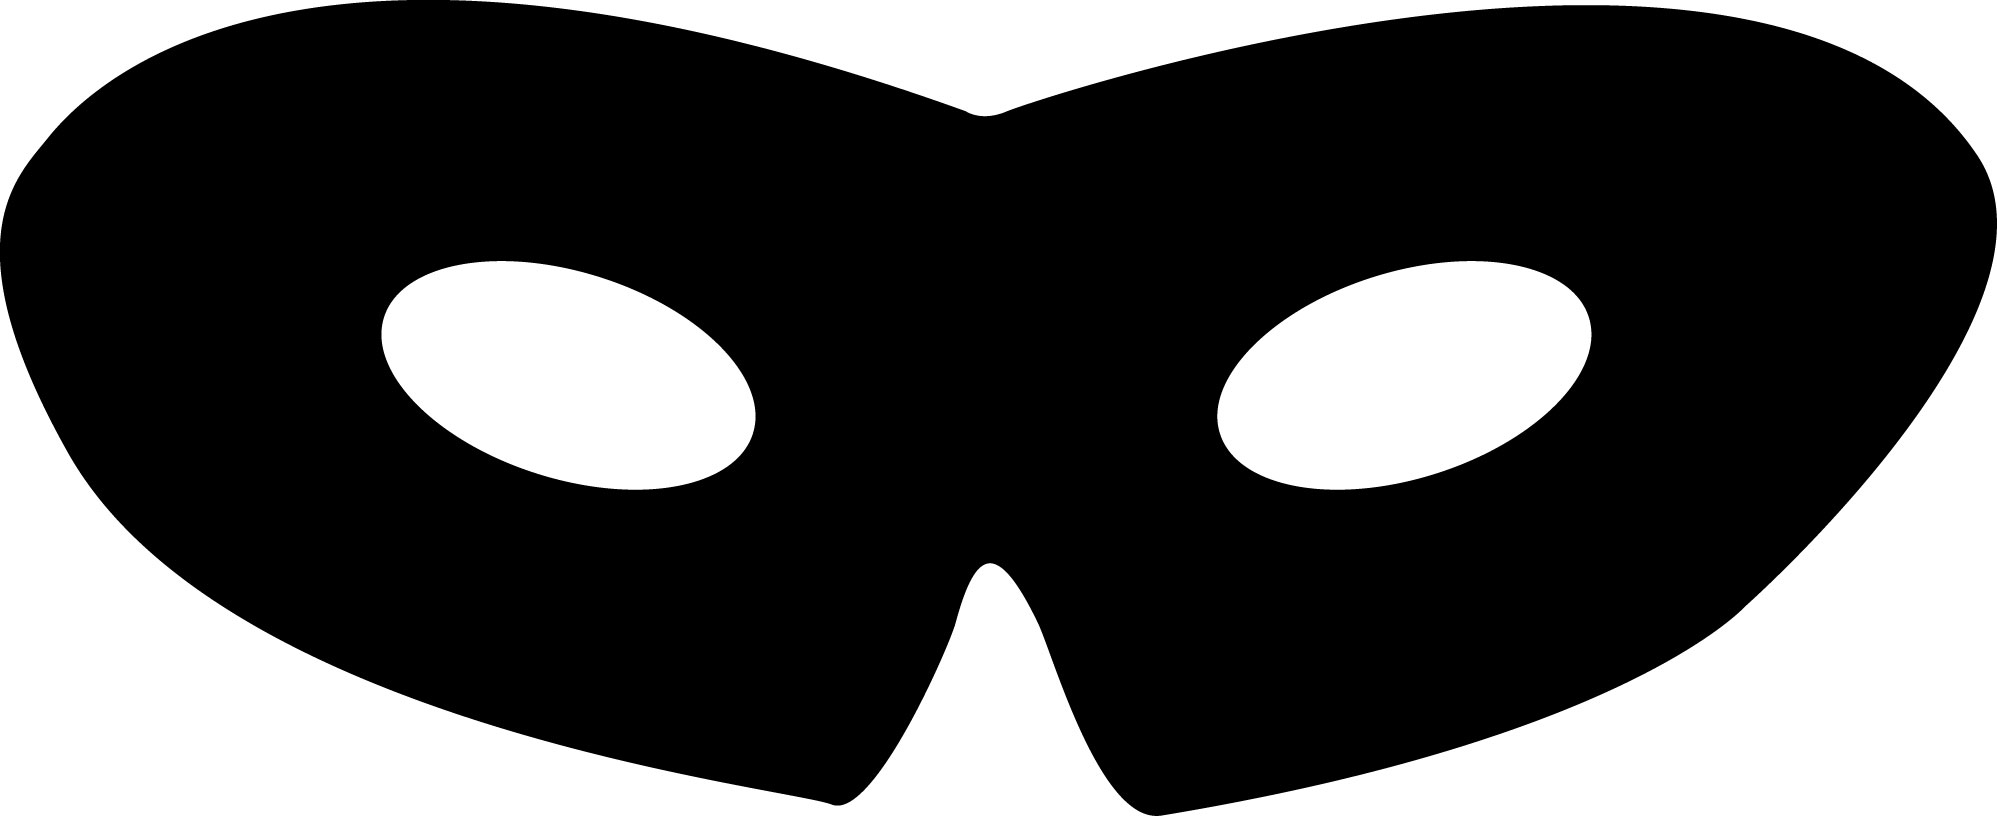 Mascara Do Zorro De Papel Para Imprimir E Recortar Carnaval